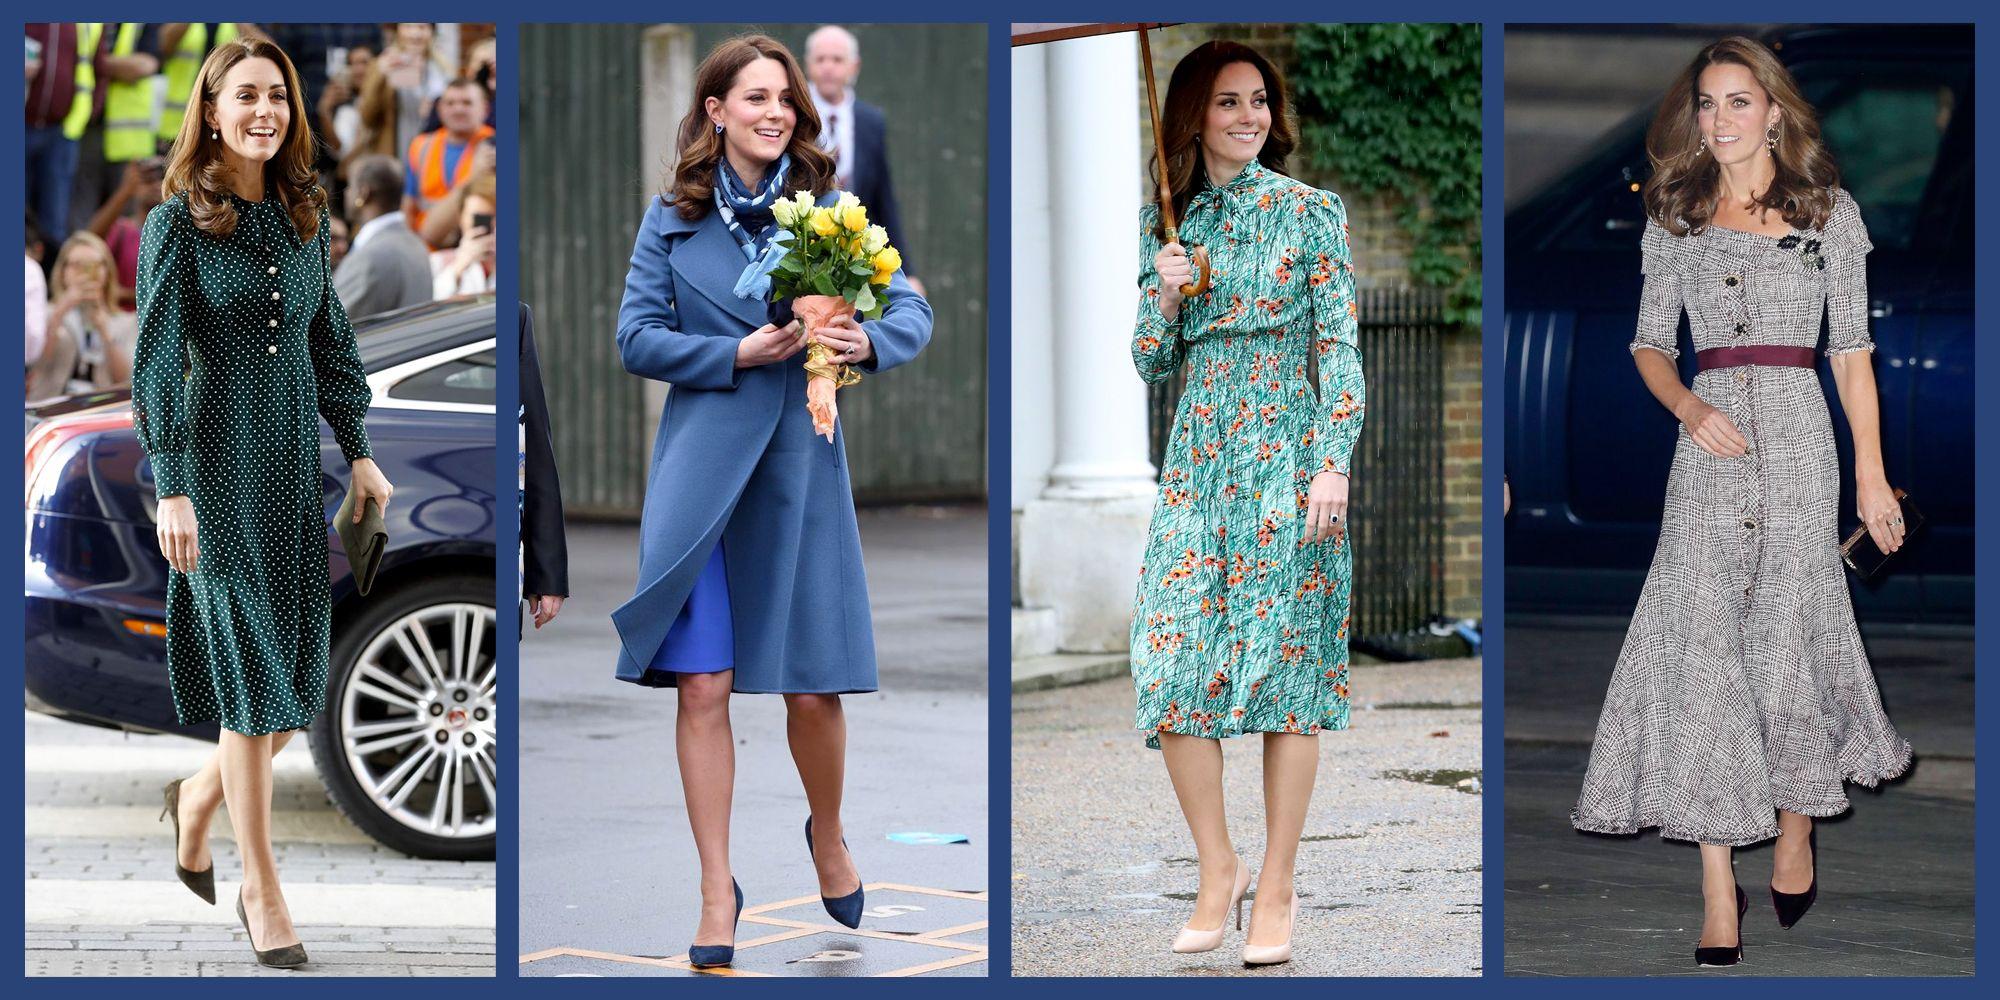 Kate Middleton\u0027s Best Fashion Looks , Duchess of Cambridge\u0027s